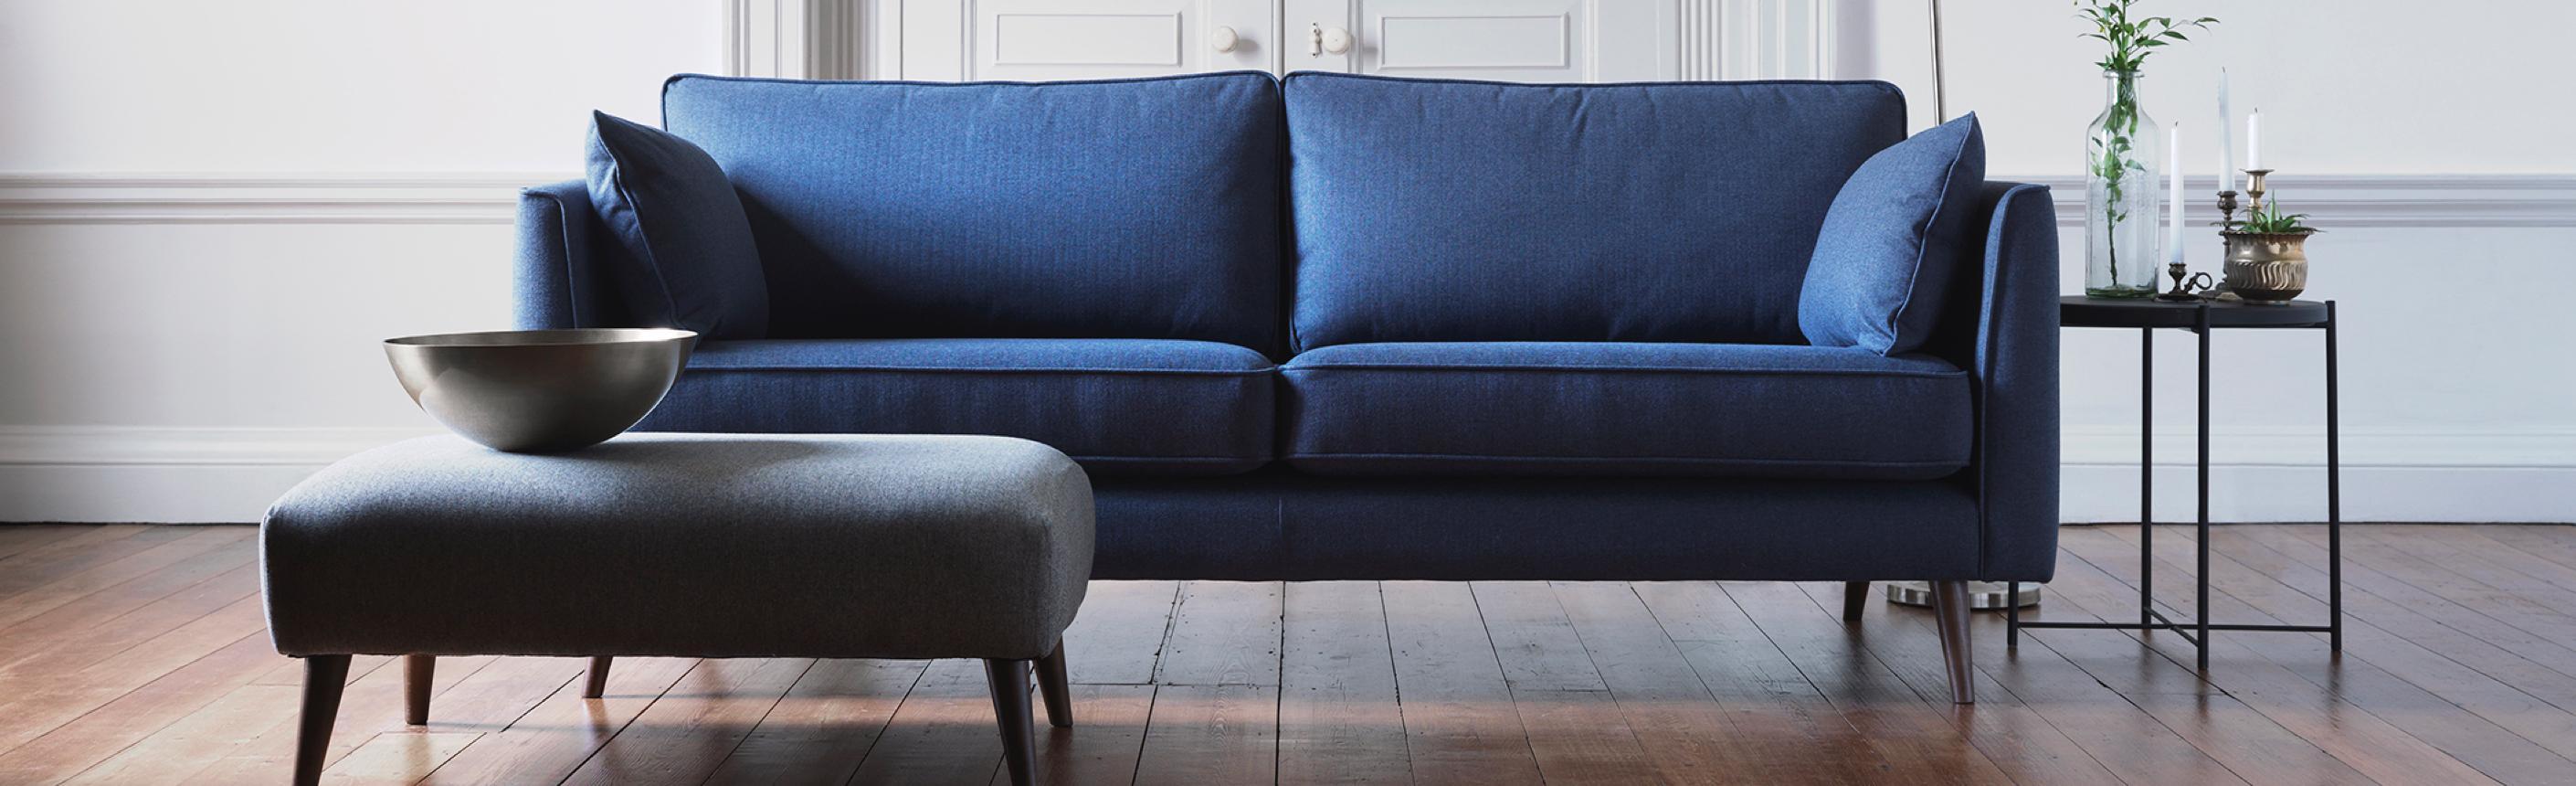 Comfort Sofa Covers